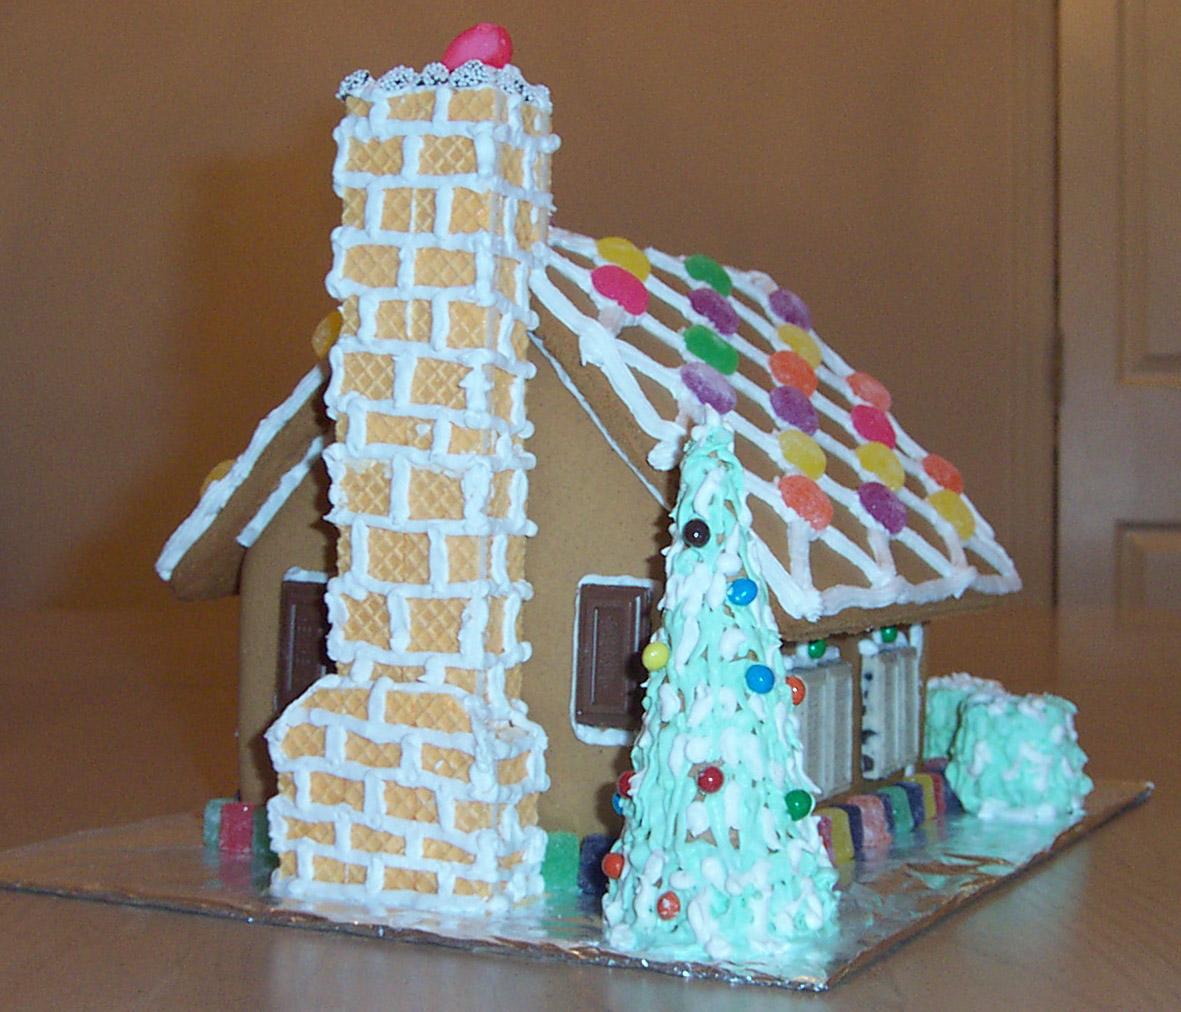 Redesign Bedroom Ideas: Creative Splatter: Gingerbread House 2002